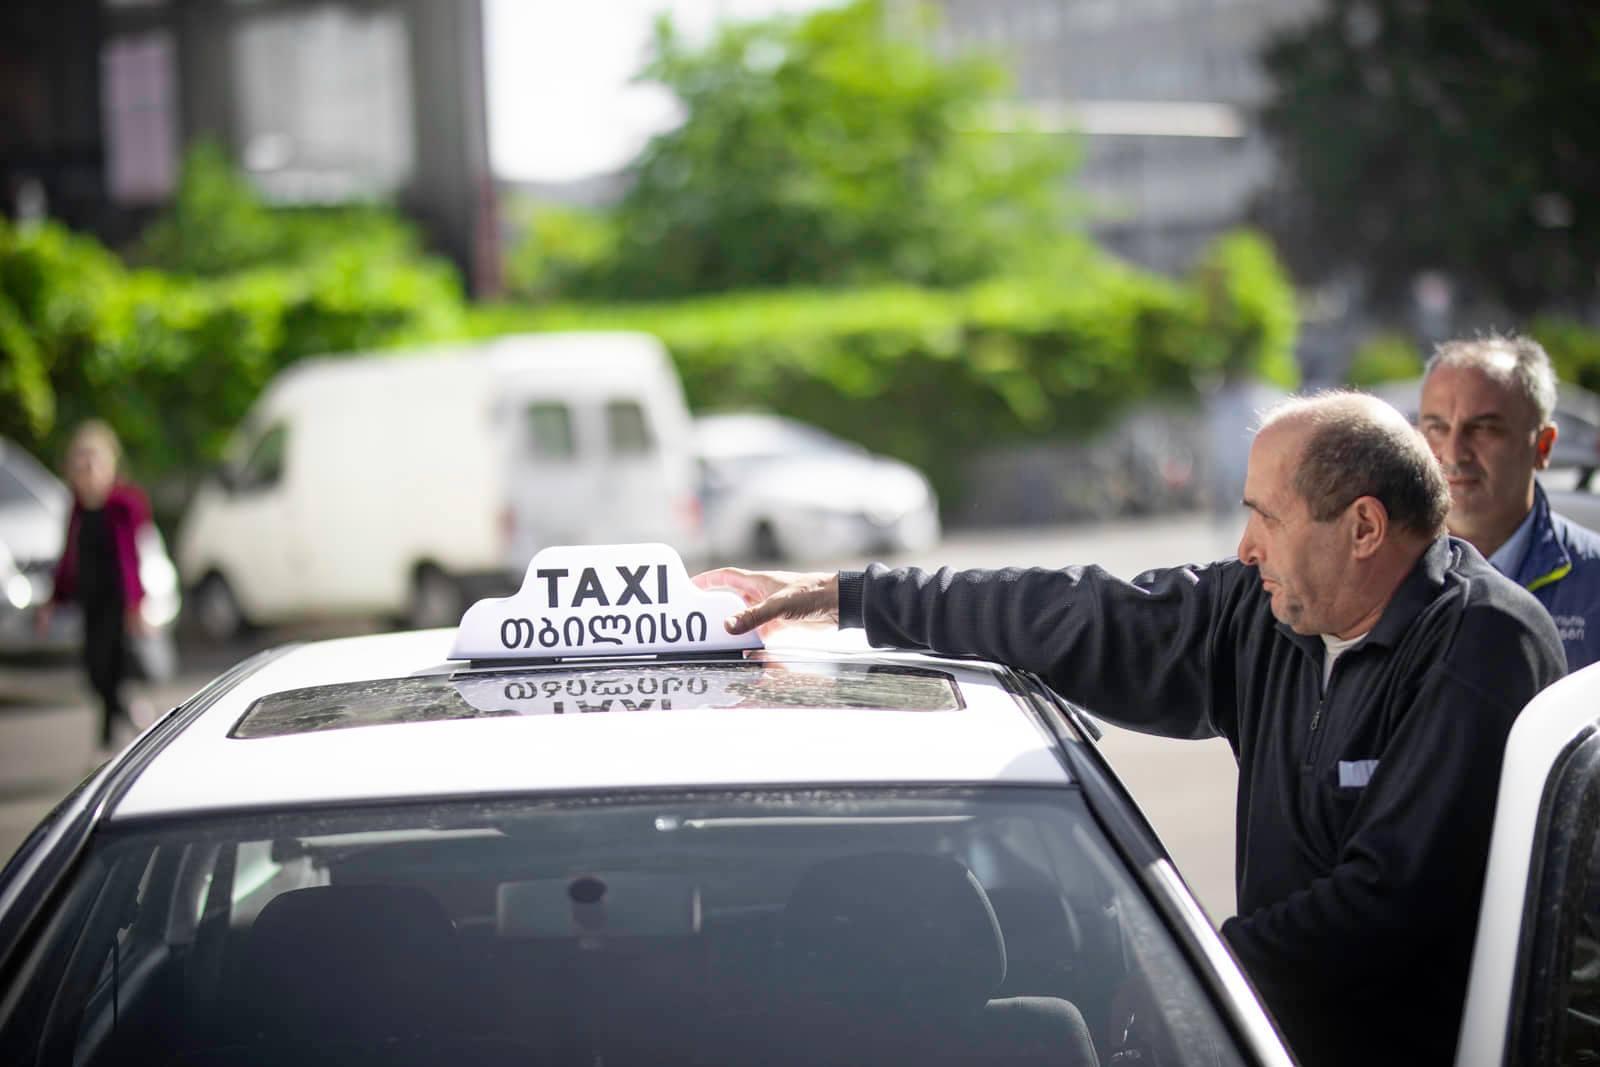 #новости Каха Каладзе, такси